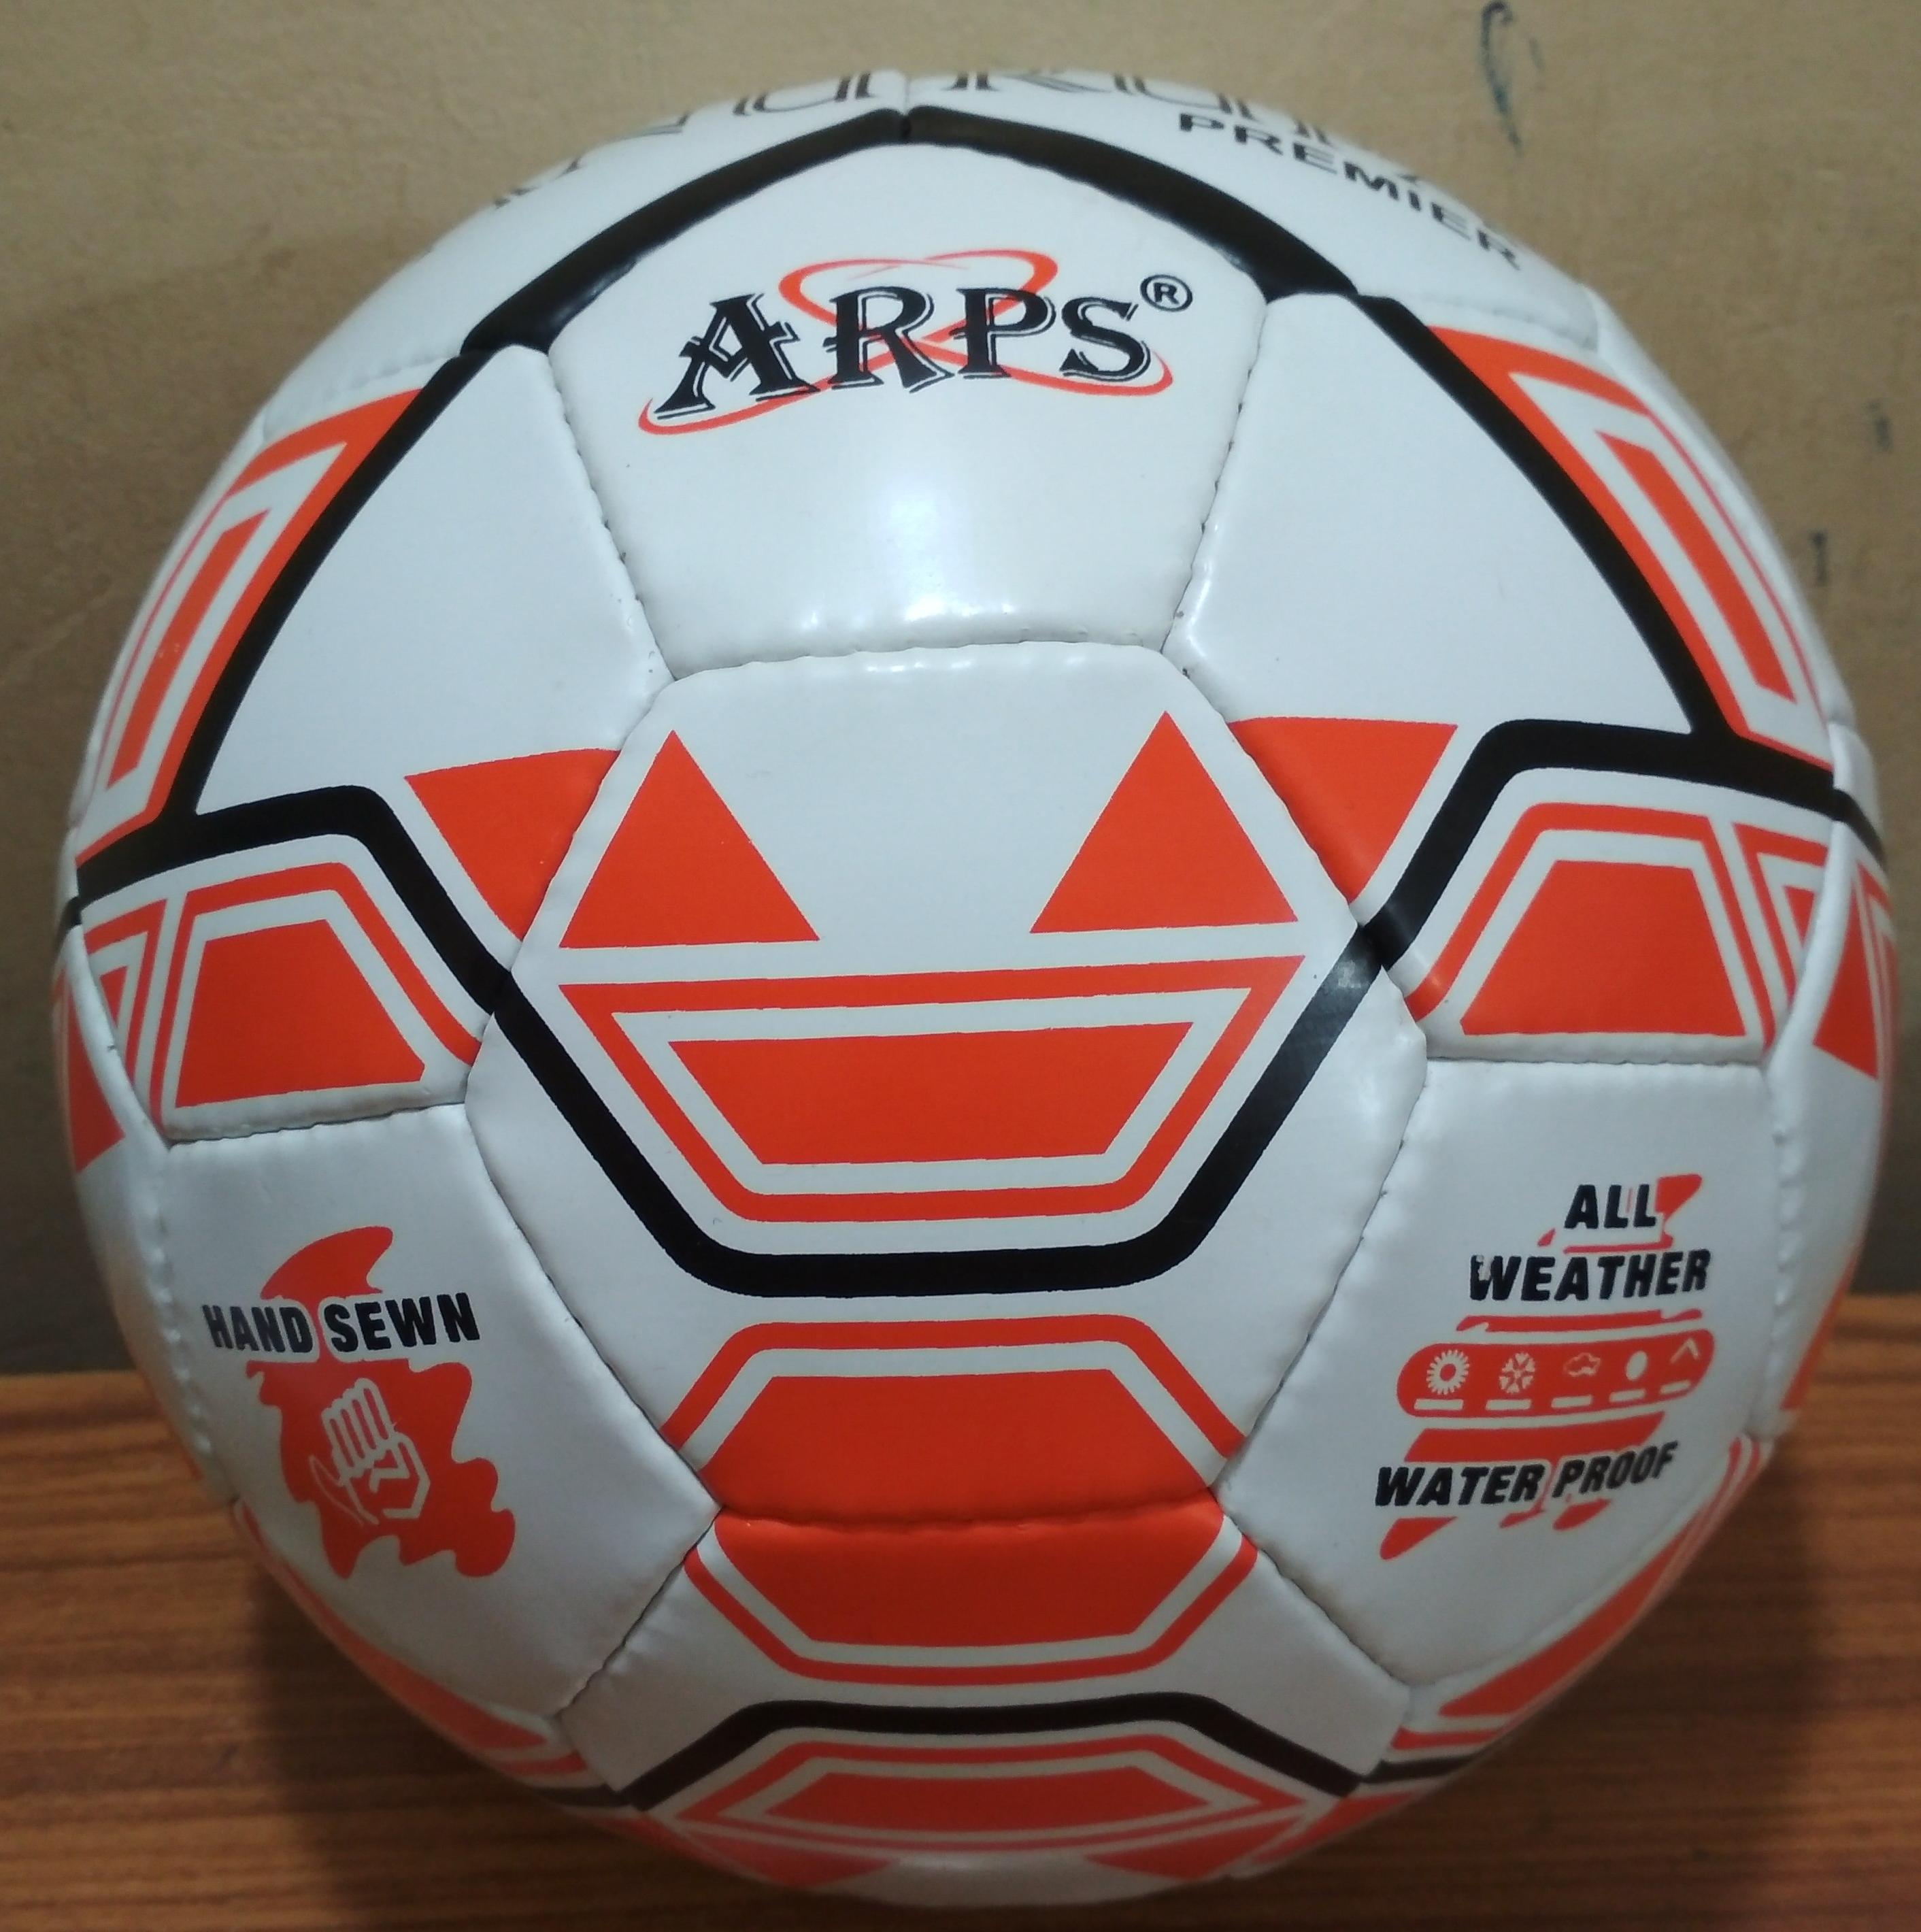 Foot Ball Anurupa Premier No.5